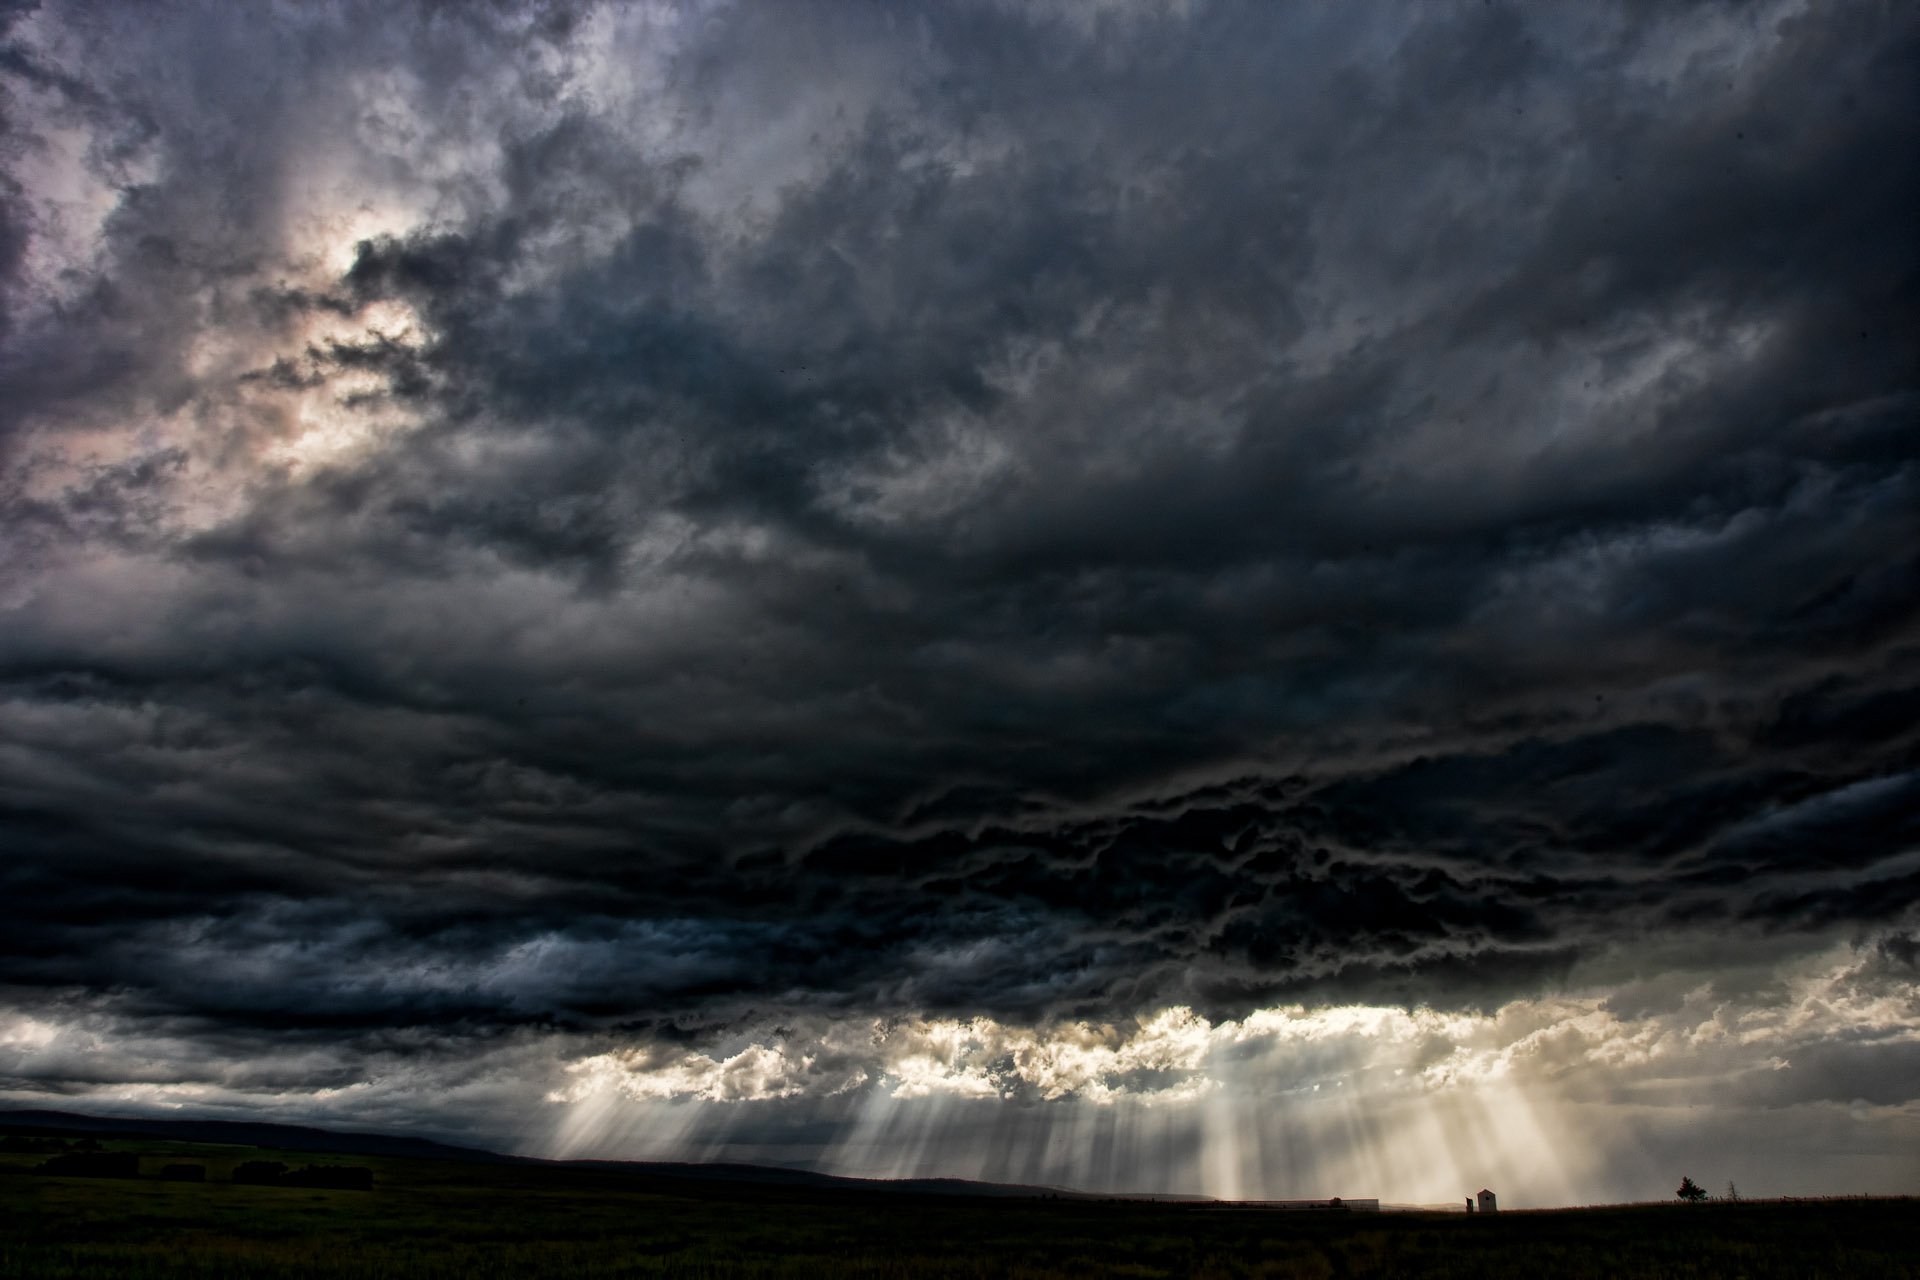 Prairie Storm: Dark Clouds, Heavy Rain and a Lightning Strike ...